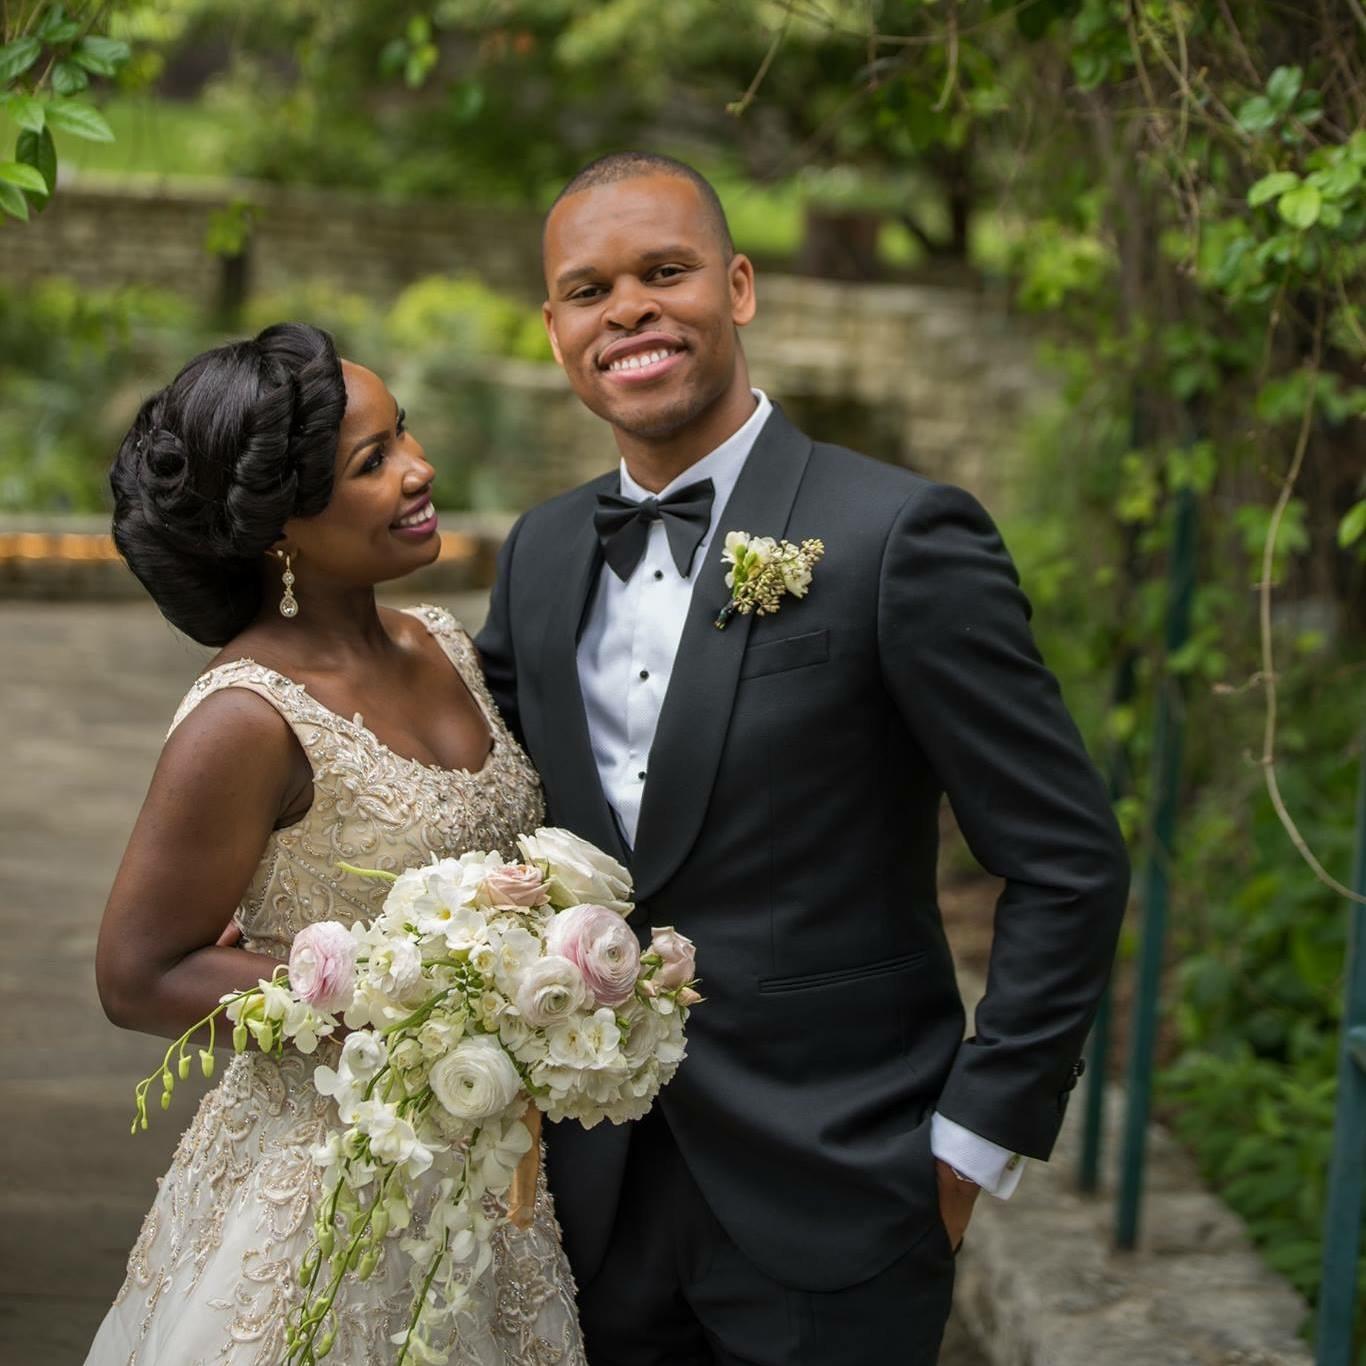 Wedding Planner Dallas: Dallas Wedding & Event Planner At Your Events Decor